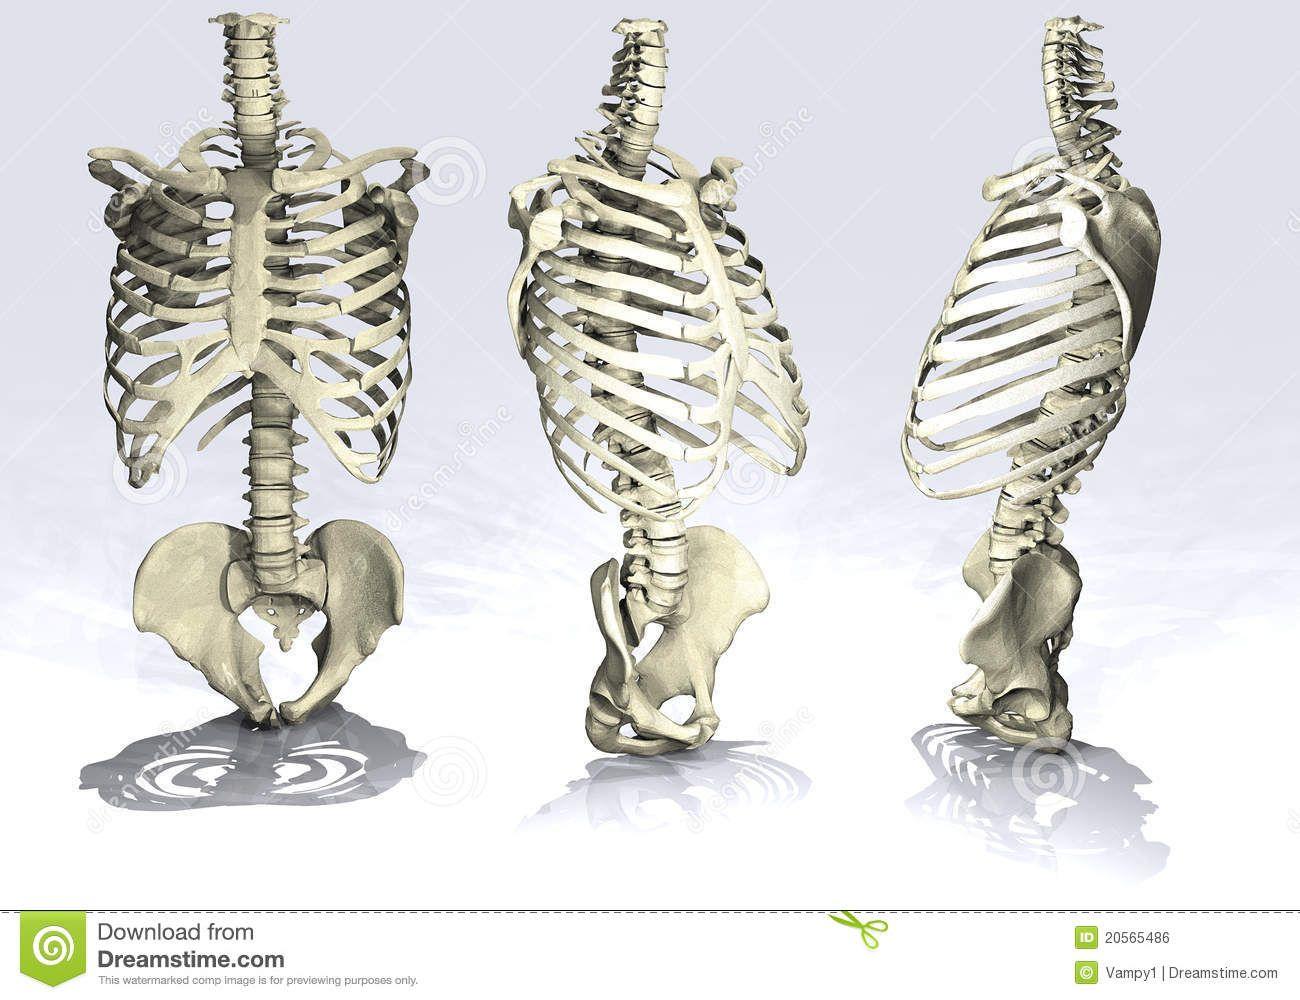 imagenes del esqueleto del torso vista lateral - Buscar con Google ...